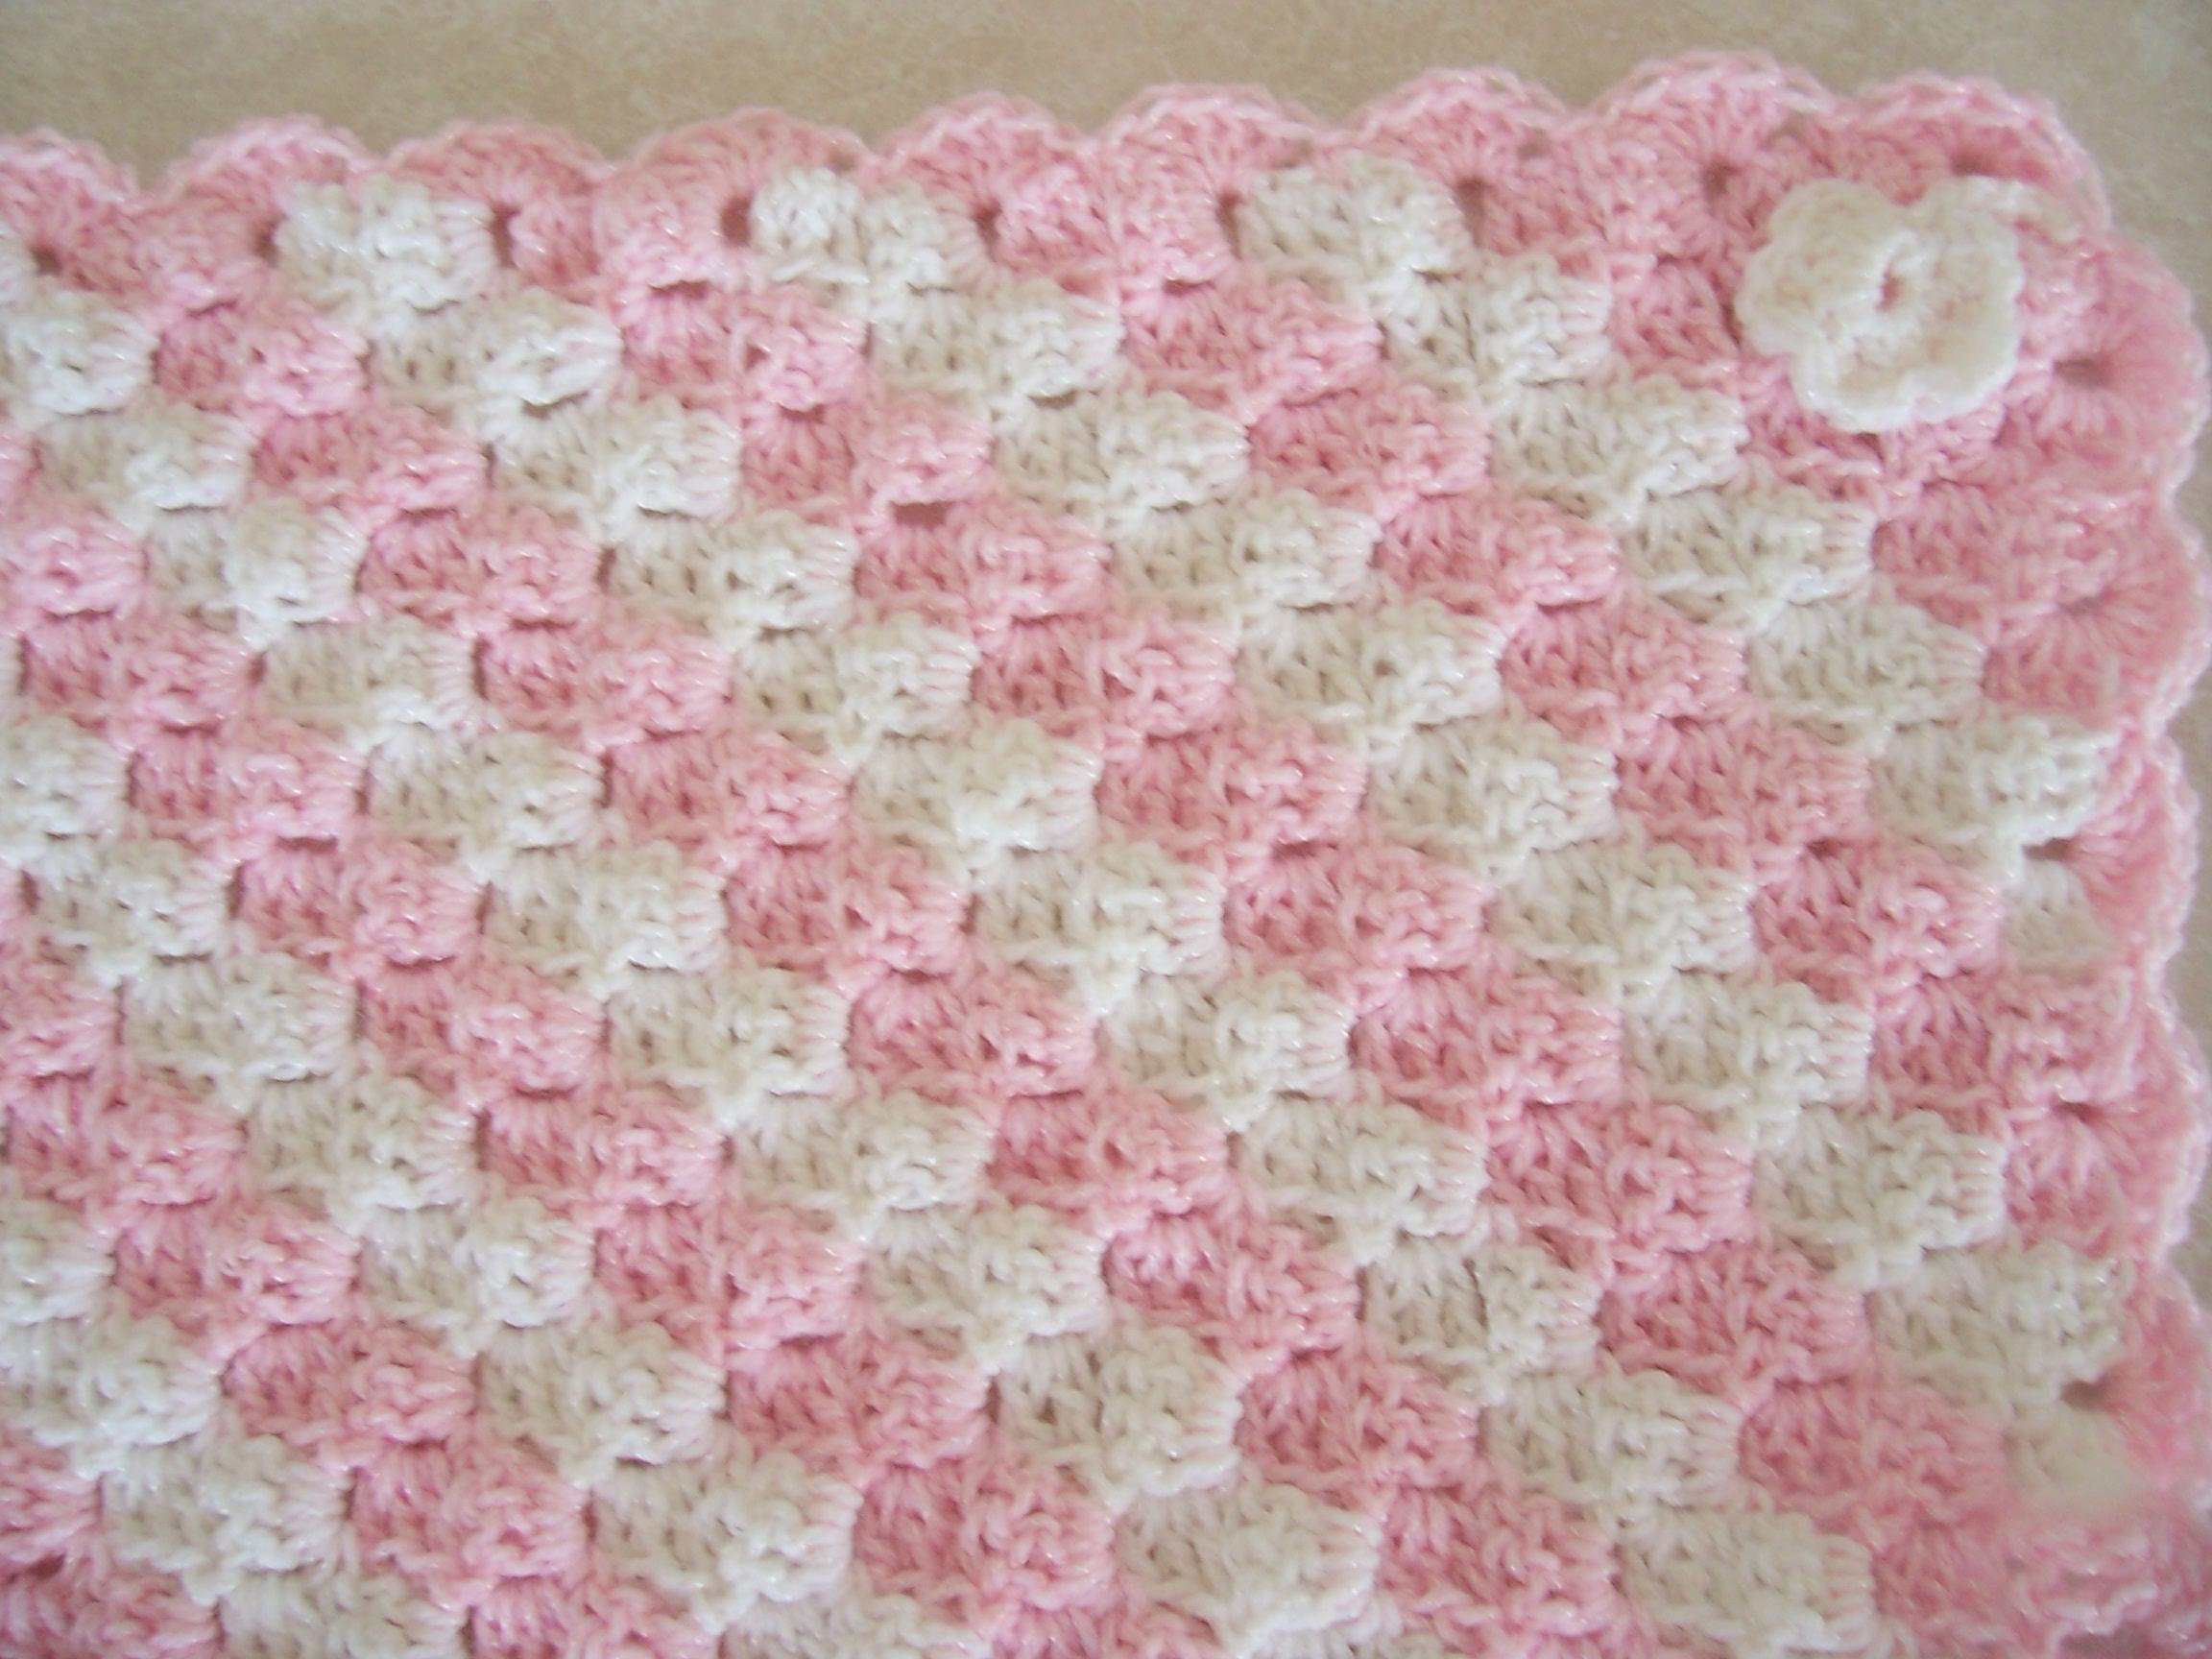 Begginer Crochet Projects Baby Blankets Crochet Ba Girl Blanket Patterns Crochet And Knit